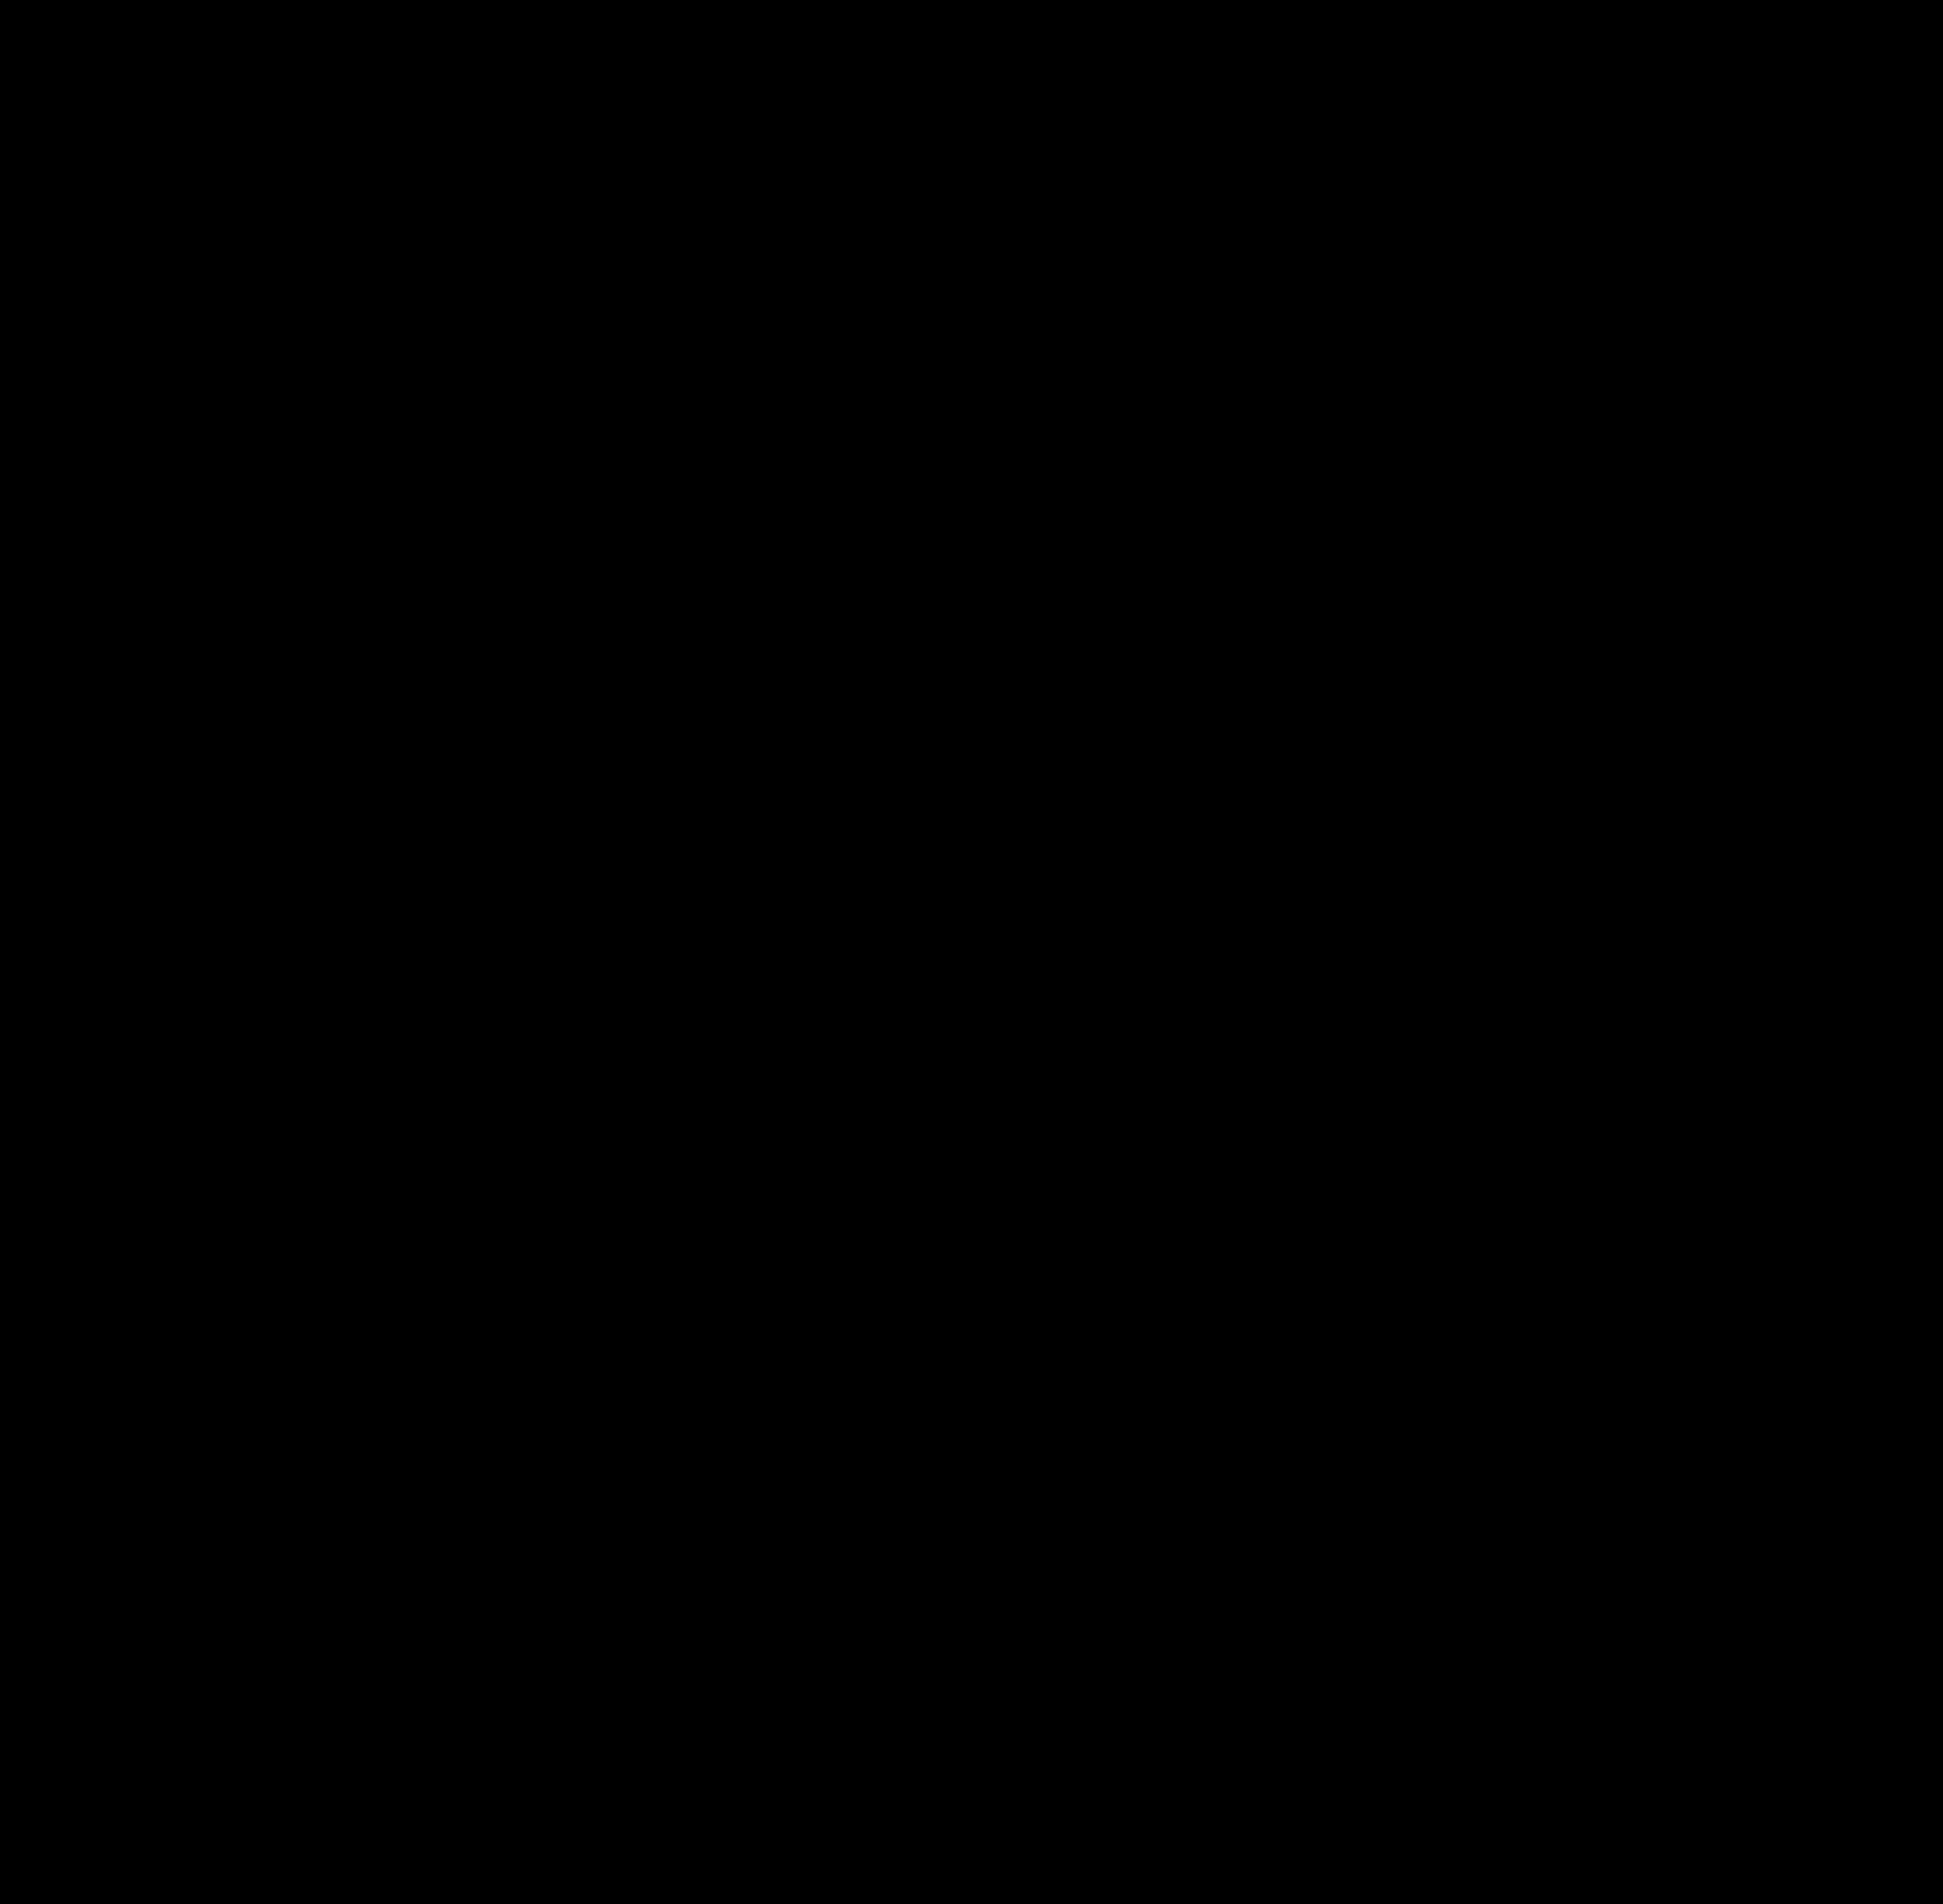 zuper